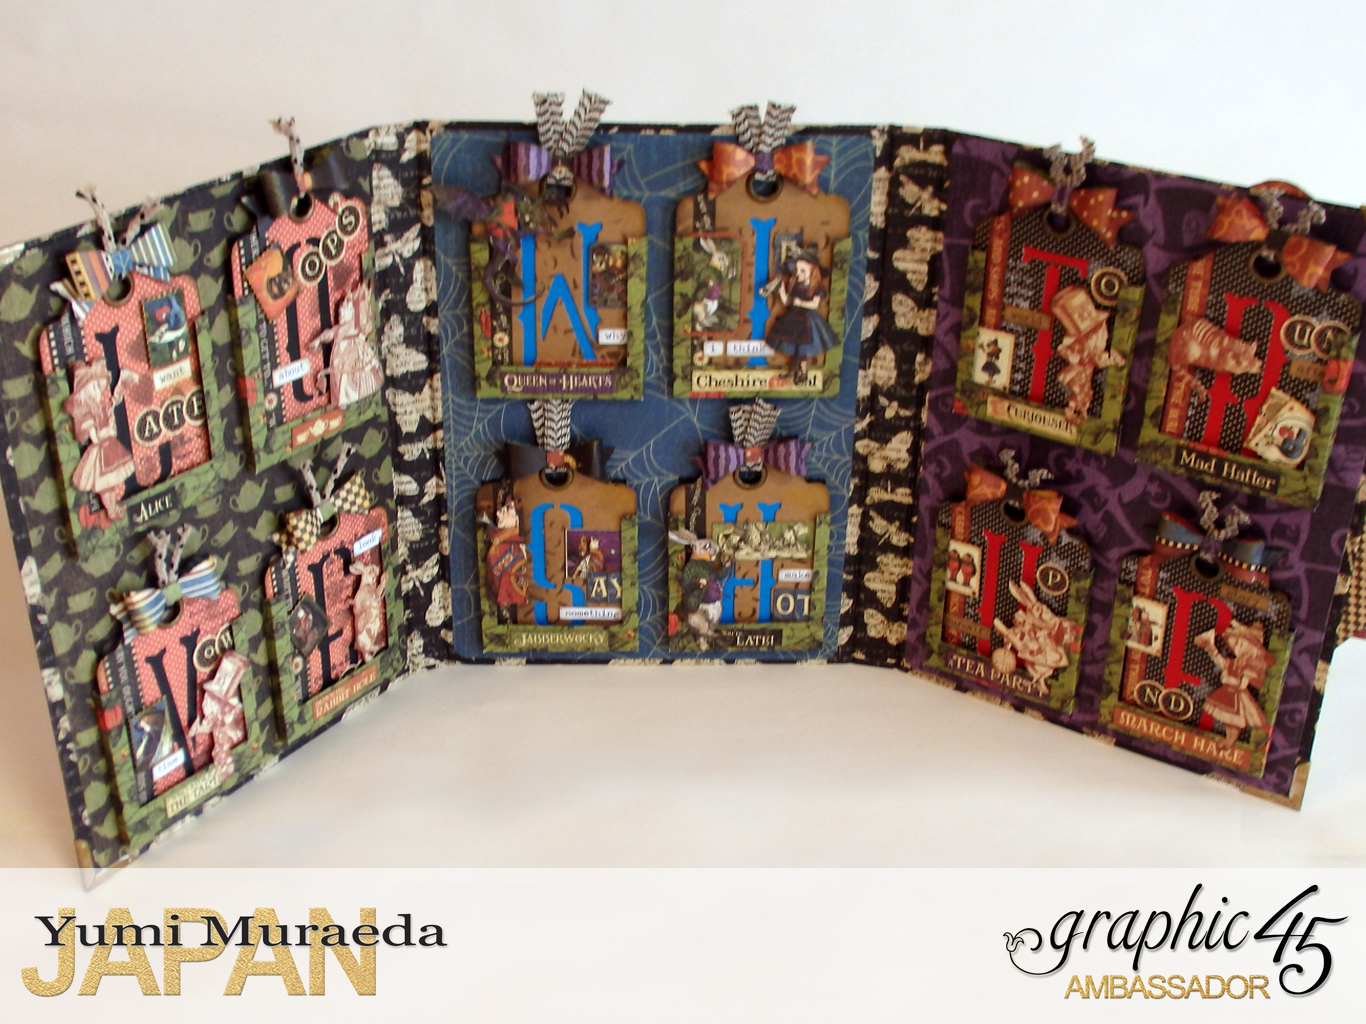 5ATC WonderlandHallowe'en in Wonderland by Yumi MuraeadaProduct by Graphic 45